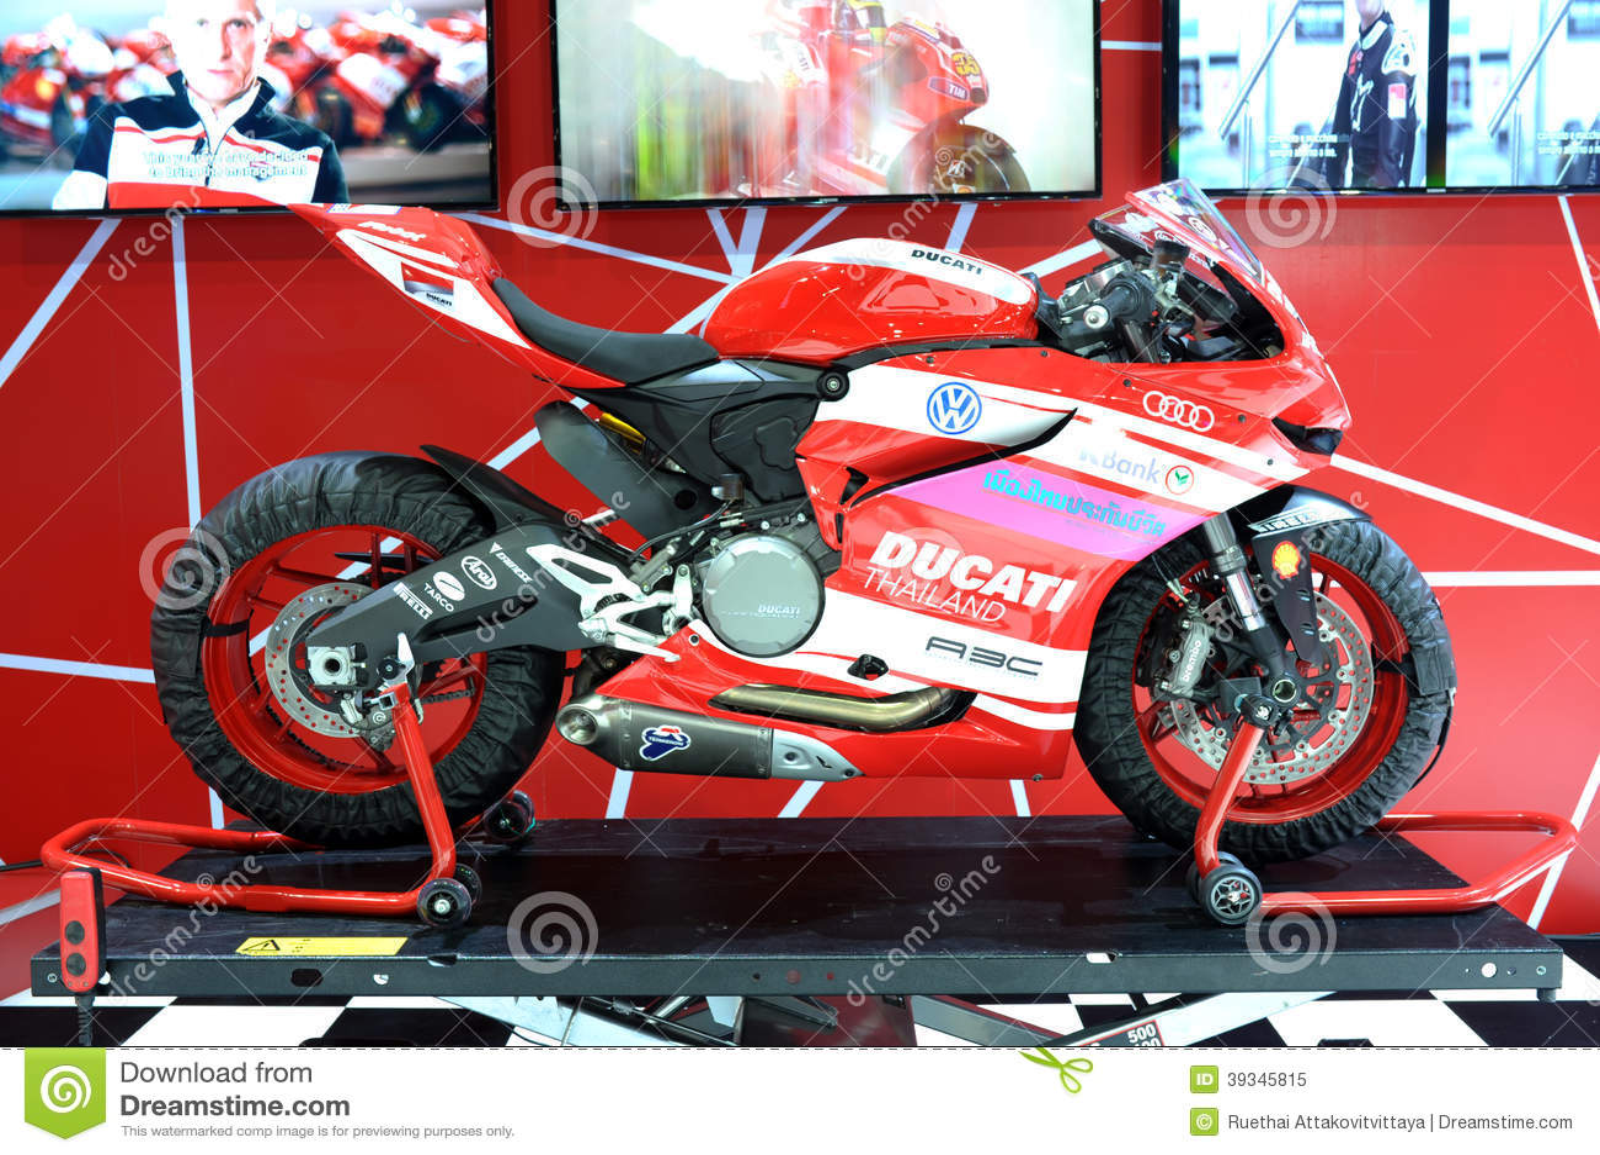 Bangkok March 24 Ducati Superbike Motorbike Editorial Image